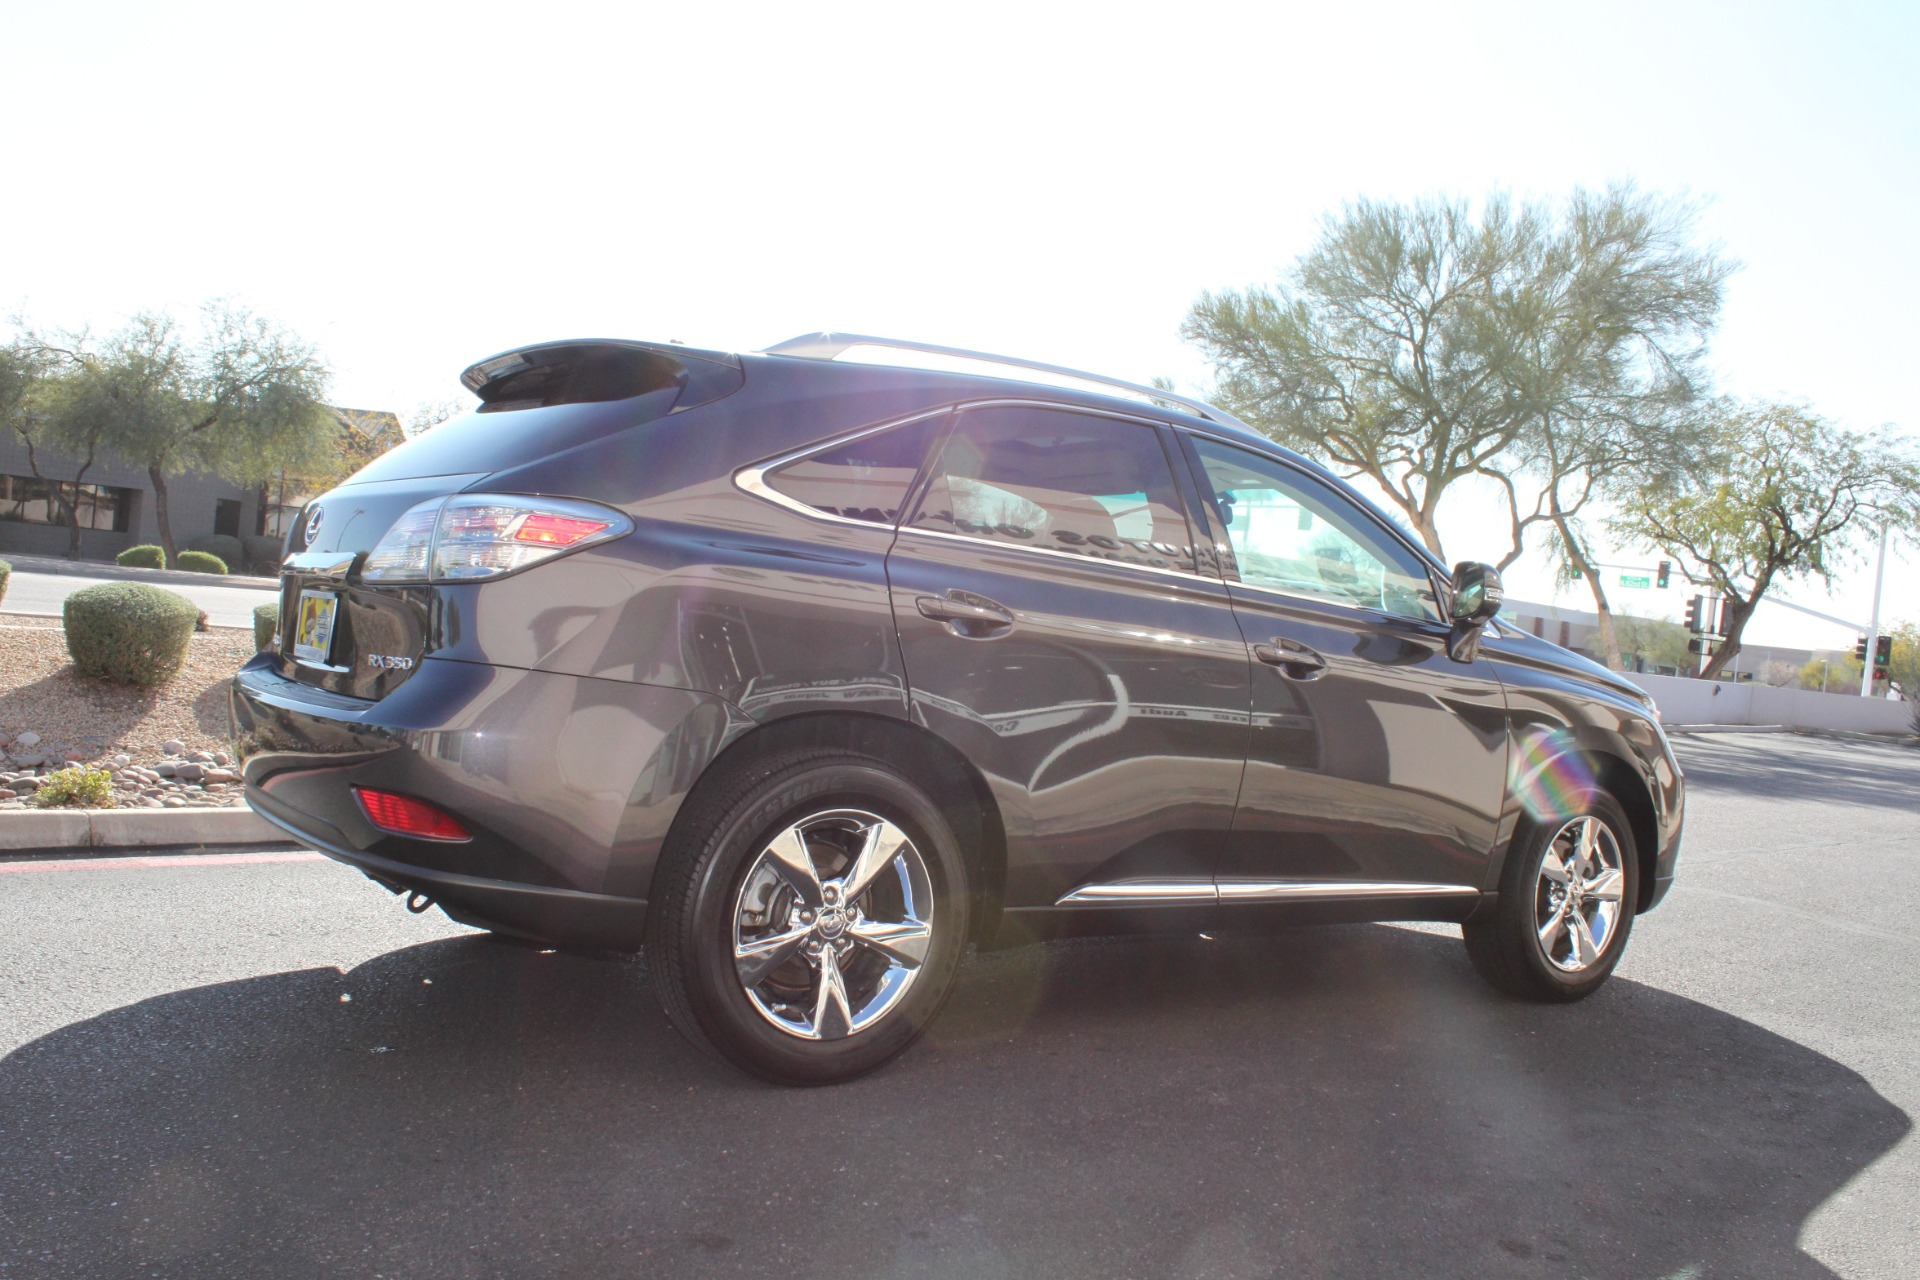 Used-2010-Lexus-RX-350-LS400